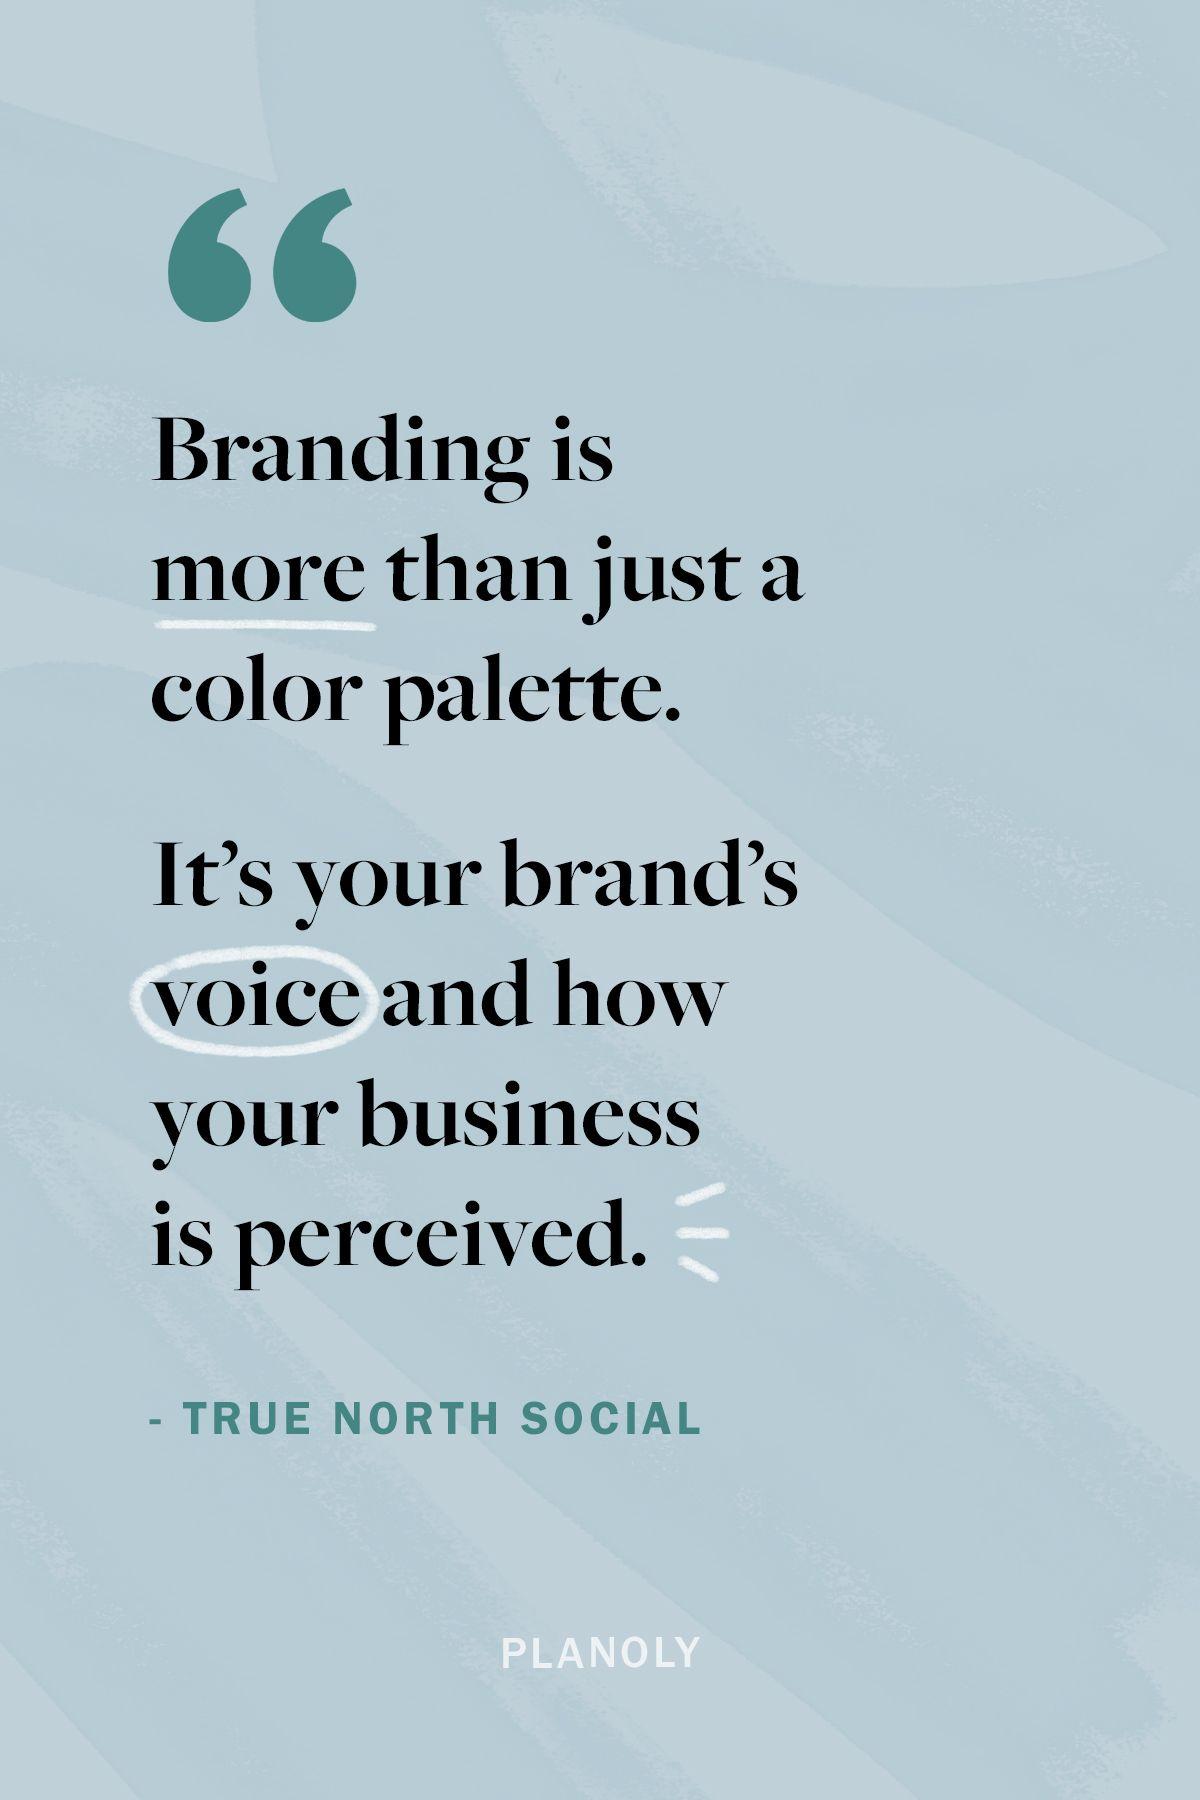 PLANOLY-Blog Post-Social Media Strategy-Image 1